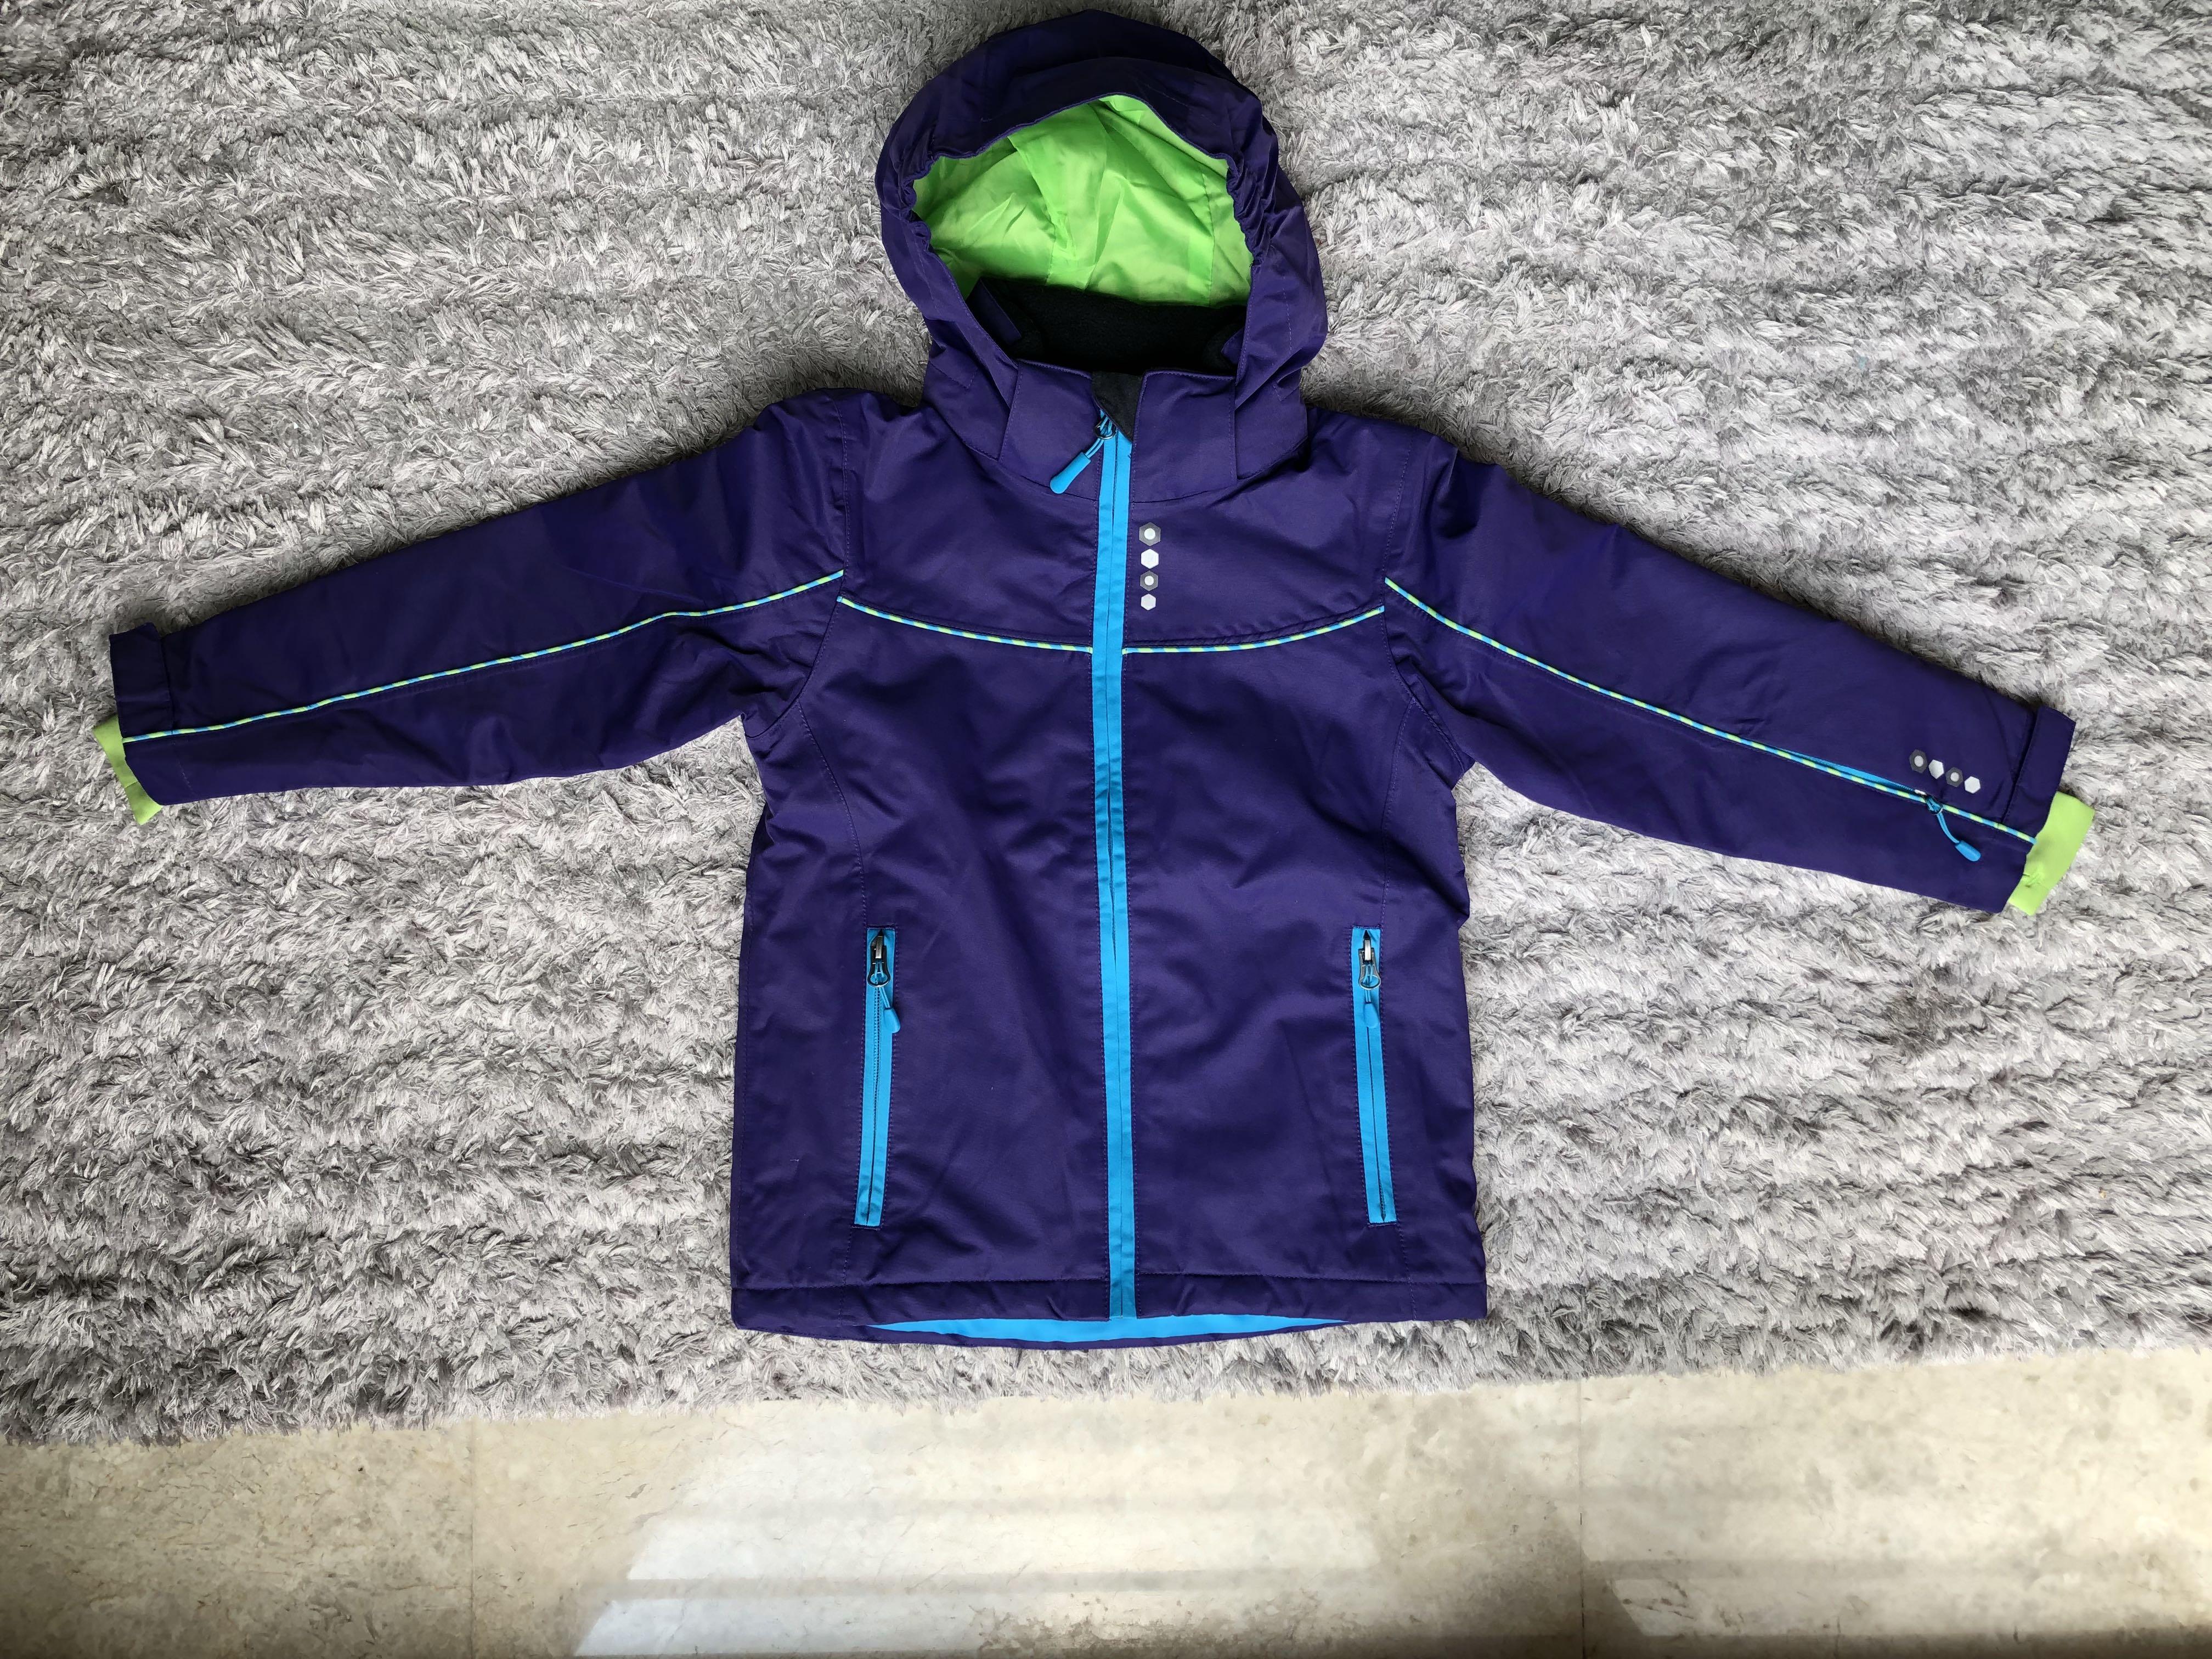 c41174bc19e2 Waterproof kids ski jacket